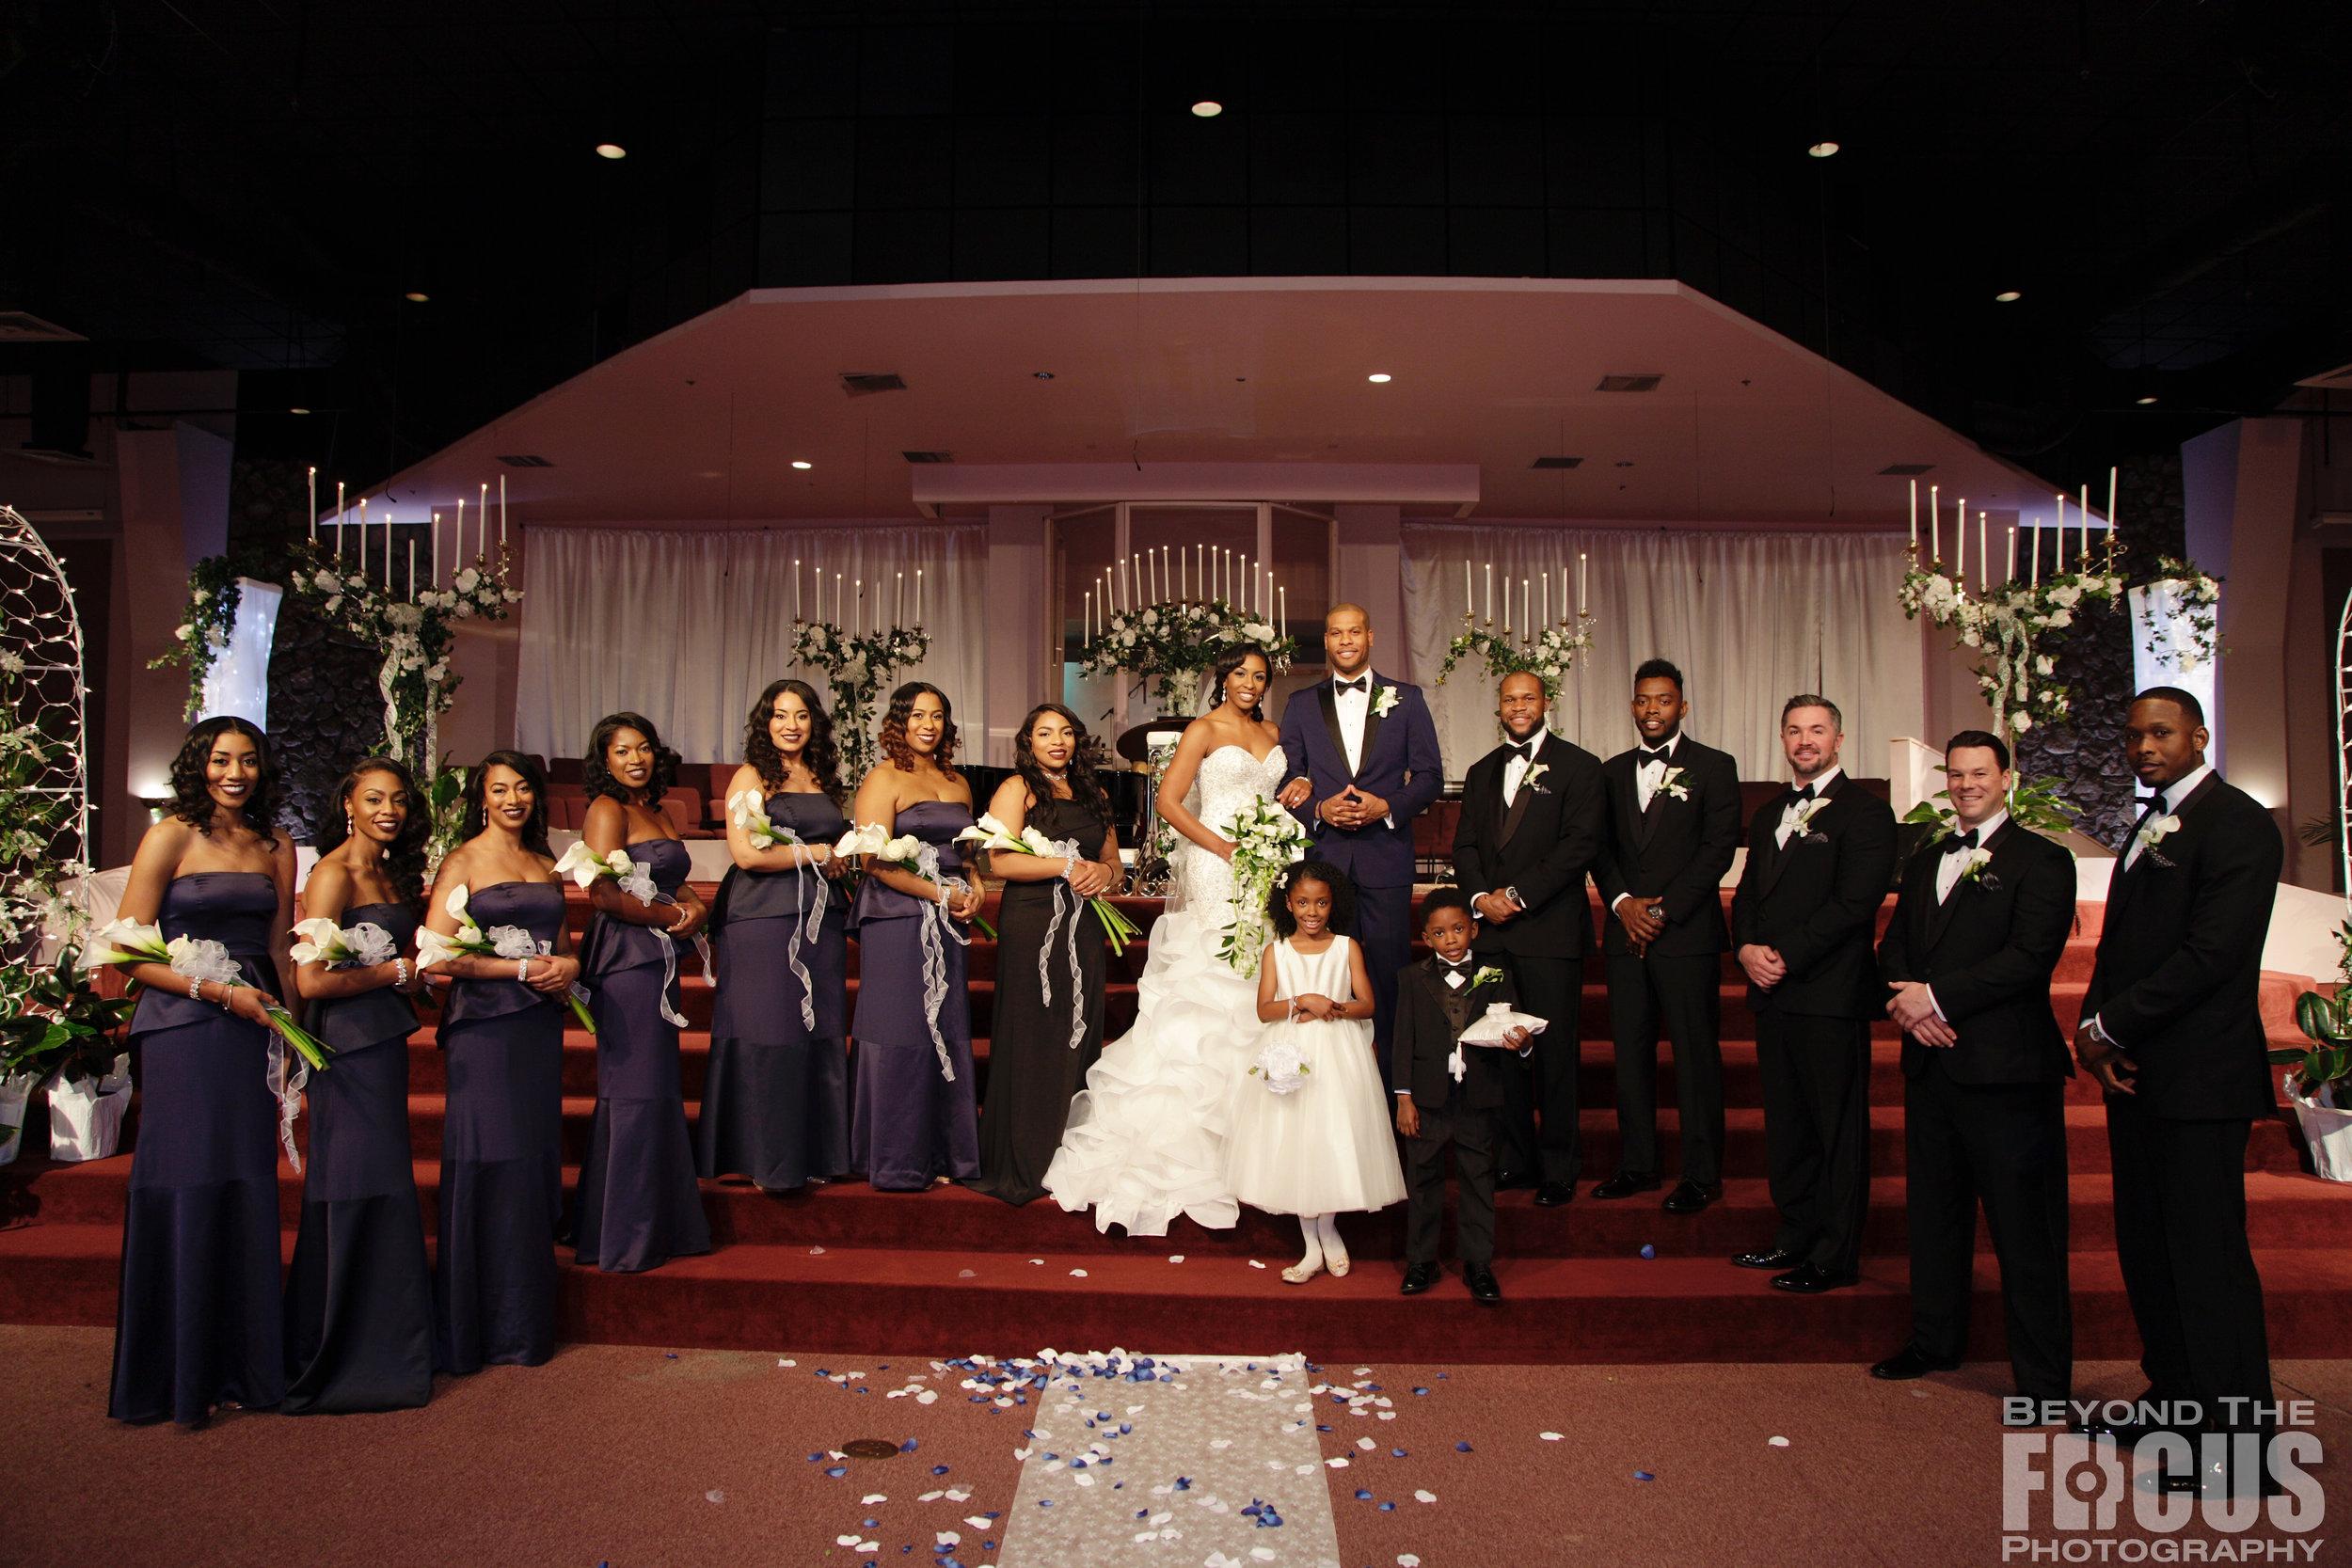 Matthews_Wedding_Ceremony_138.jpg